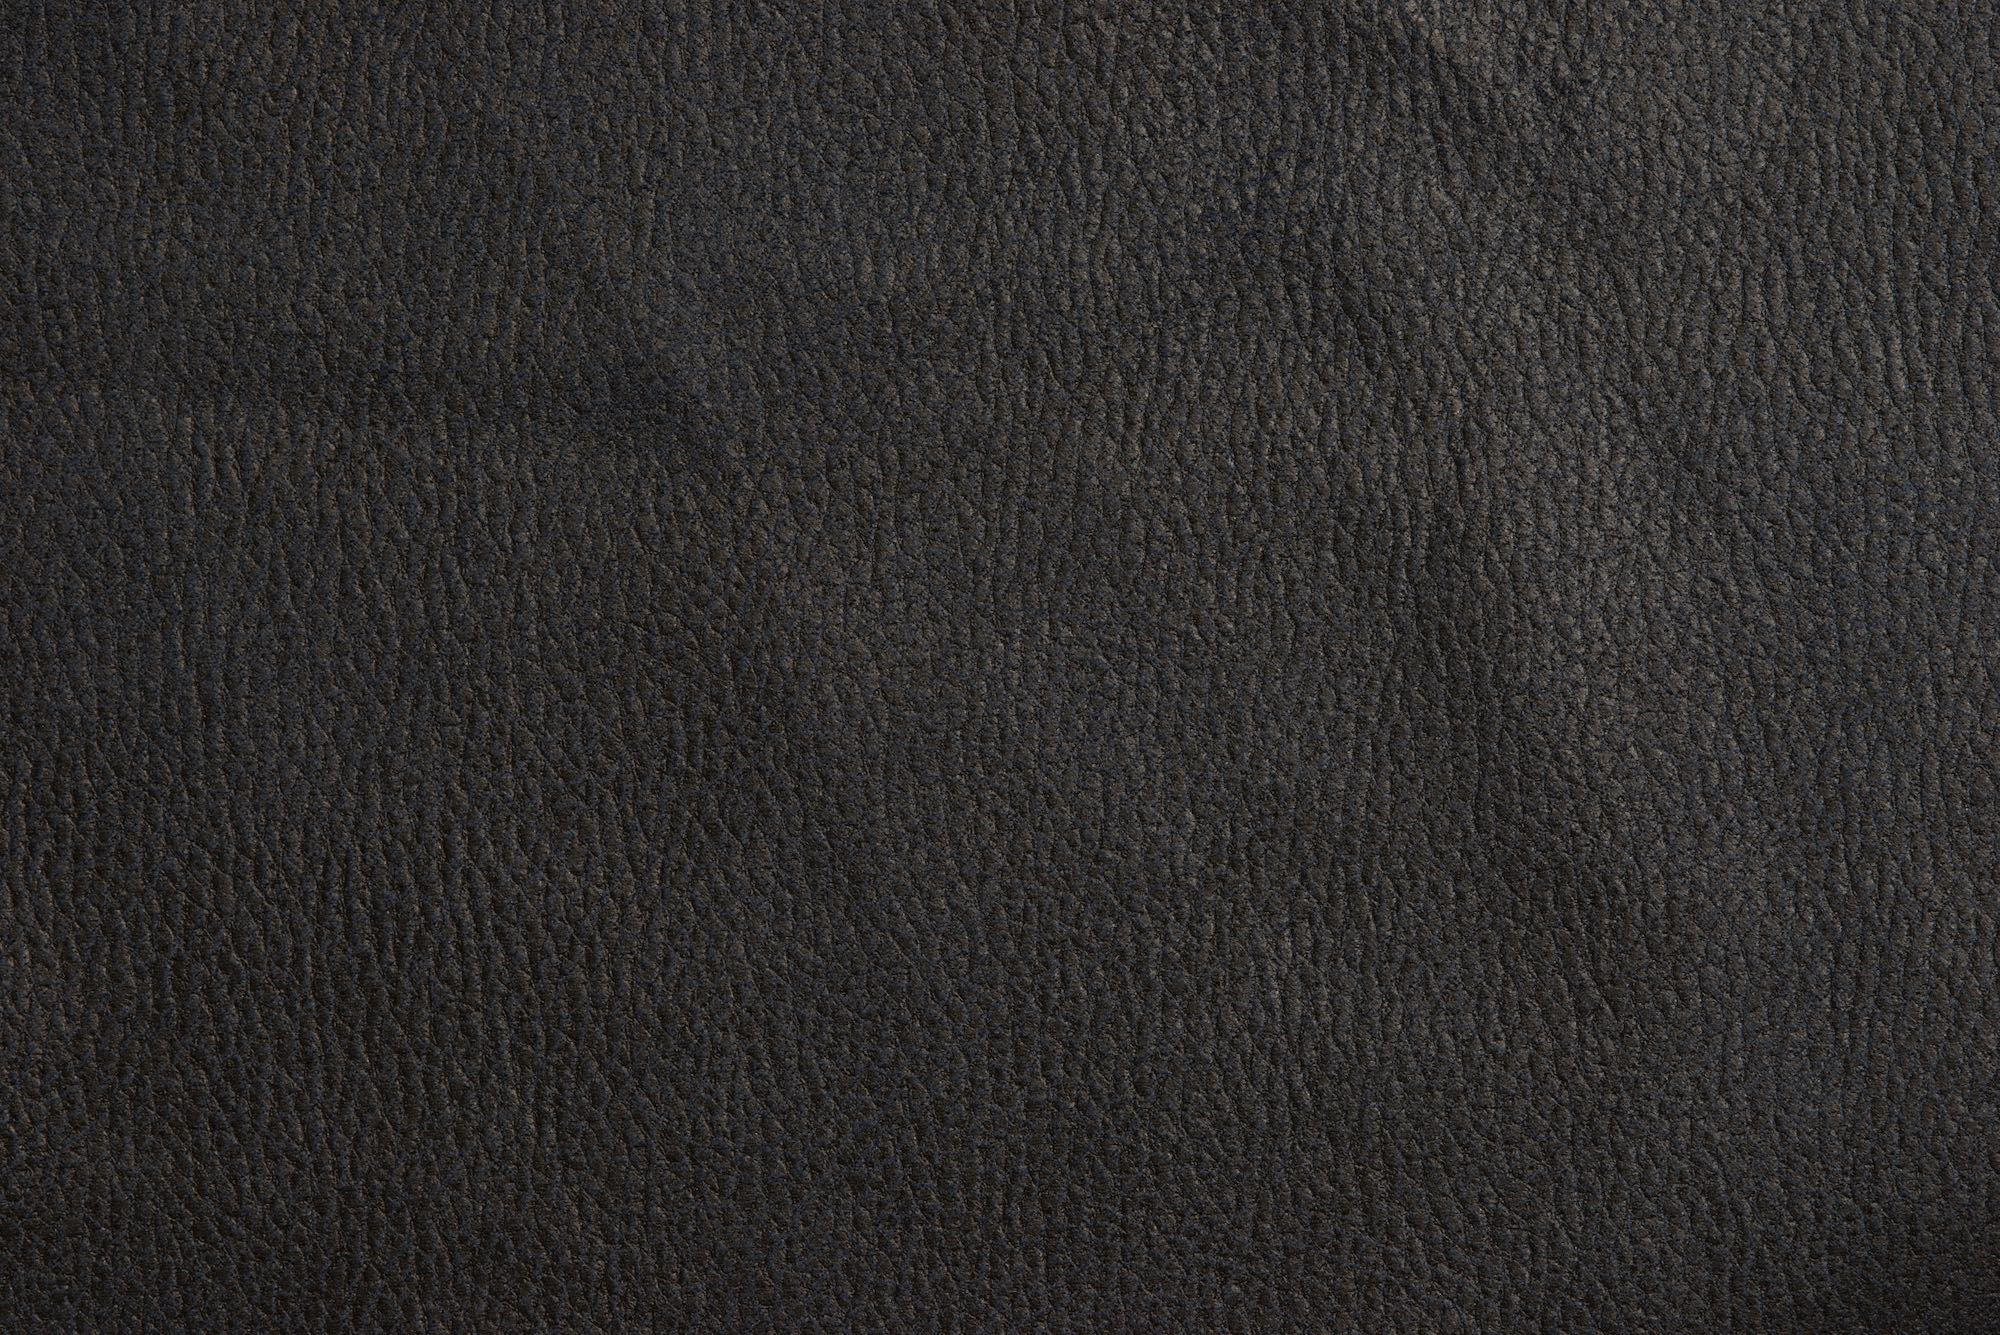 000000blankの素材拡大画像